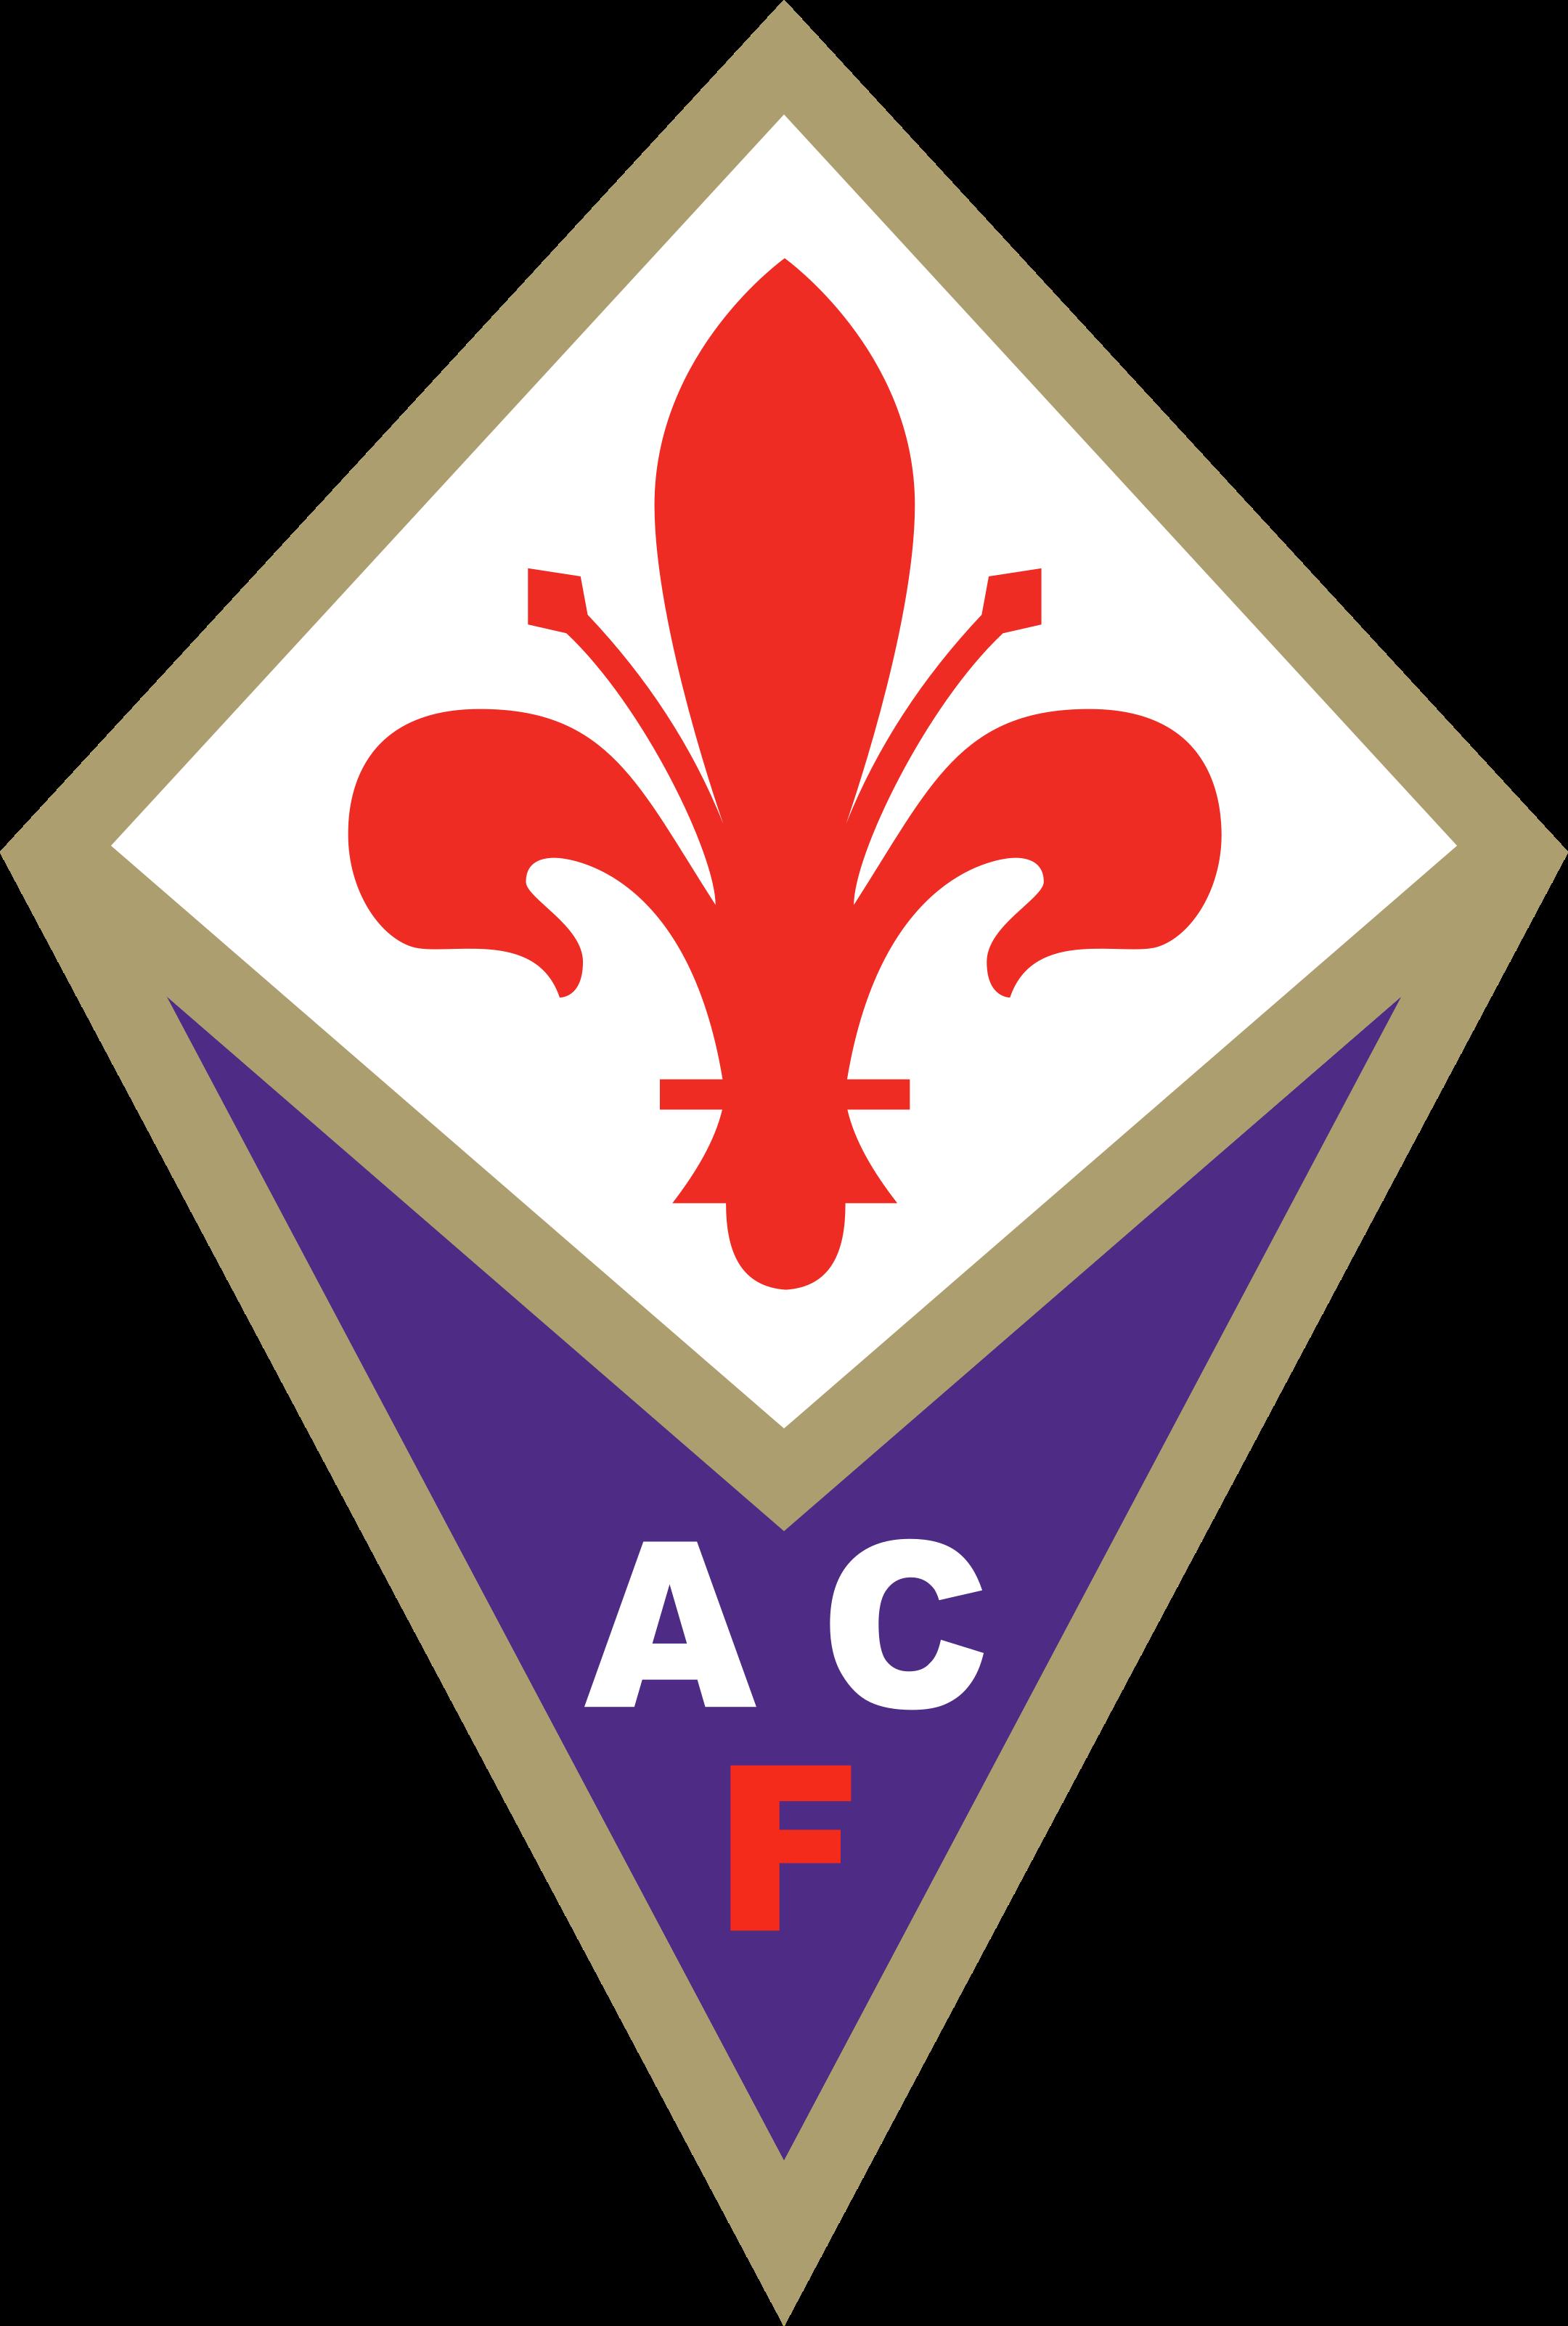 fiorentina logo 1 - ACF Fiorentina Logo